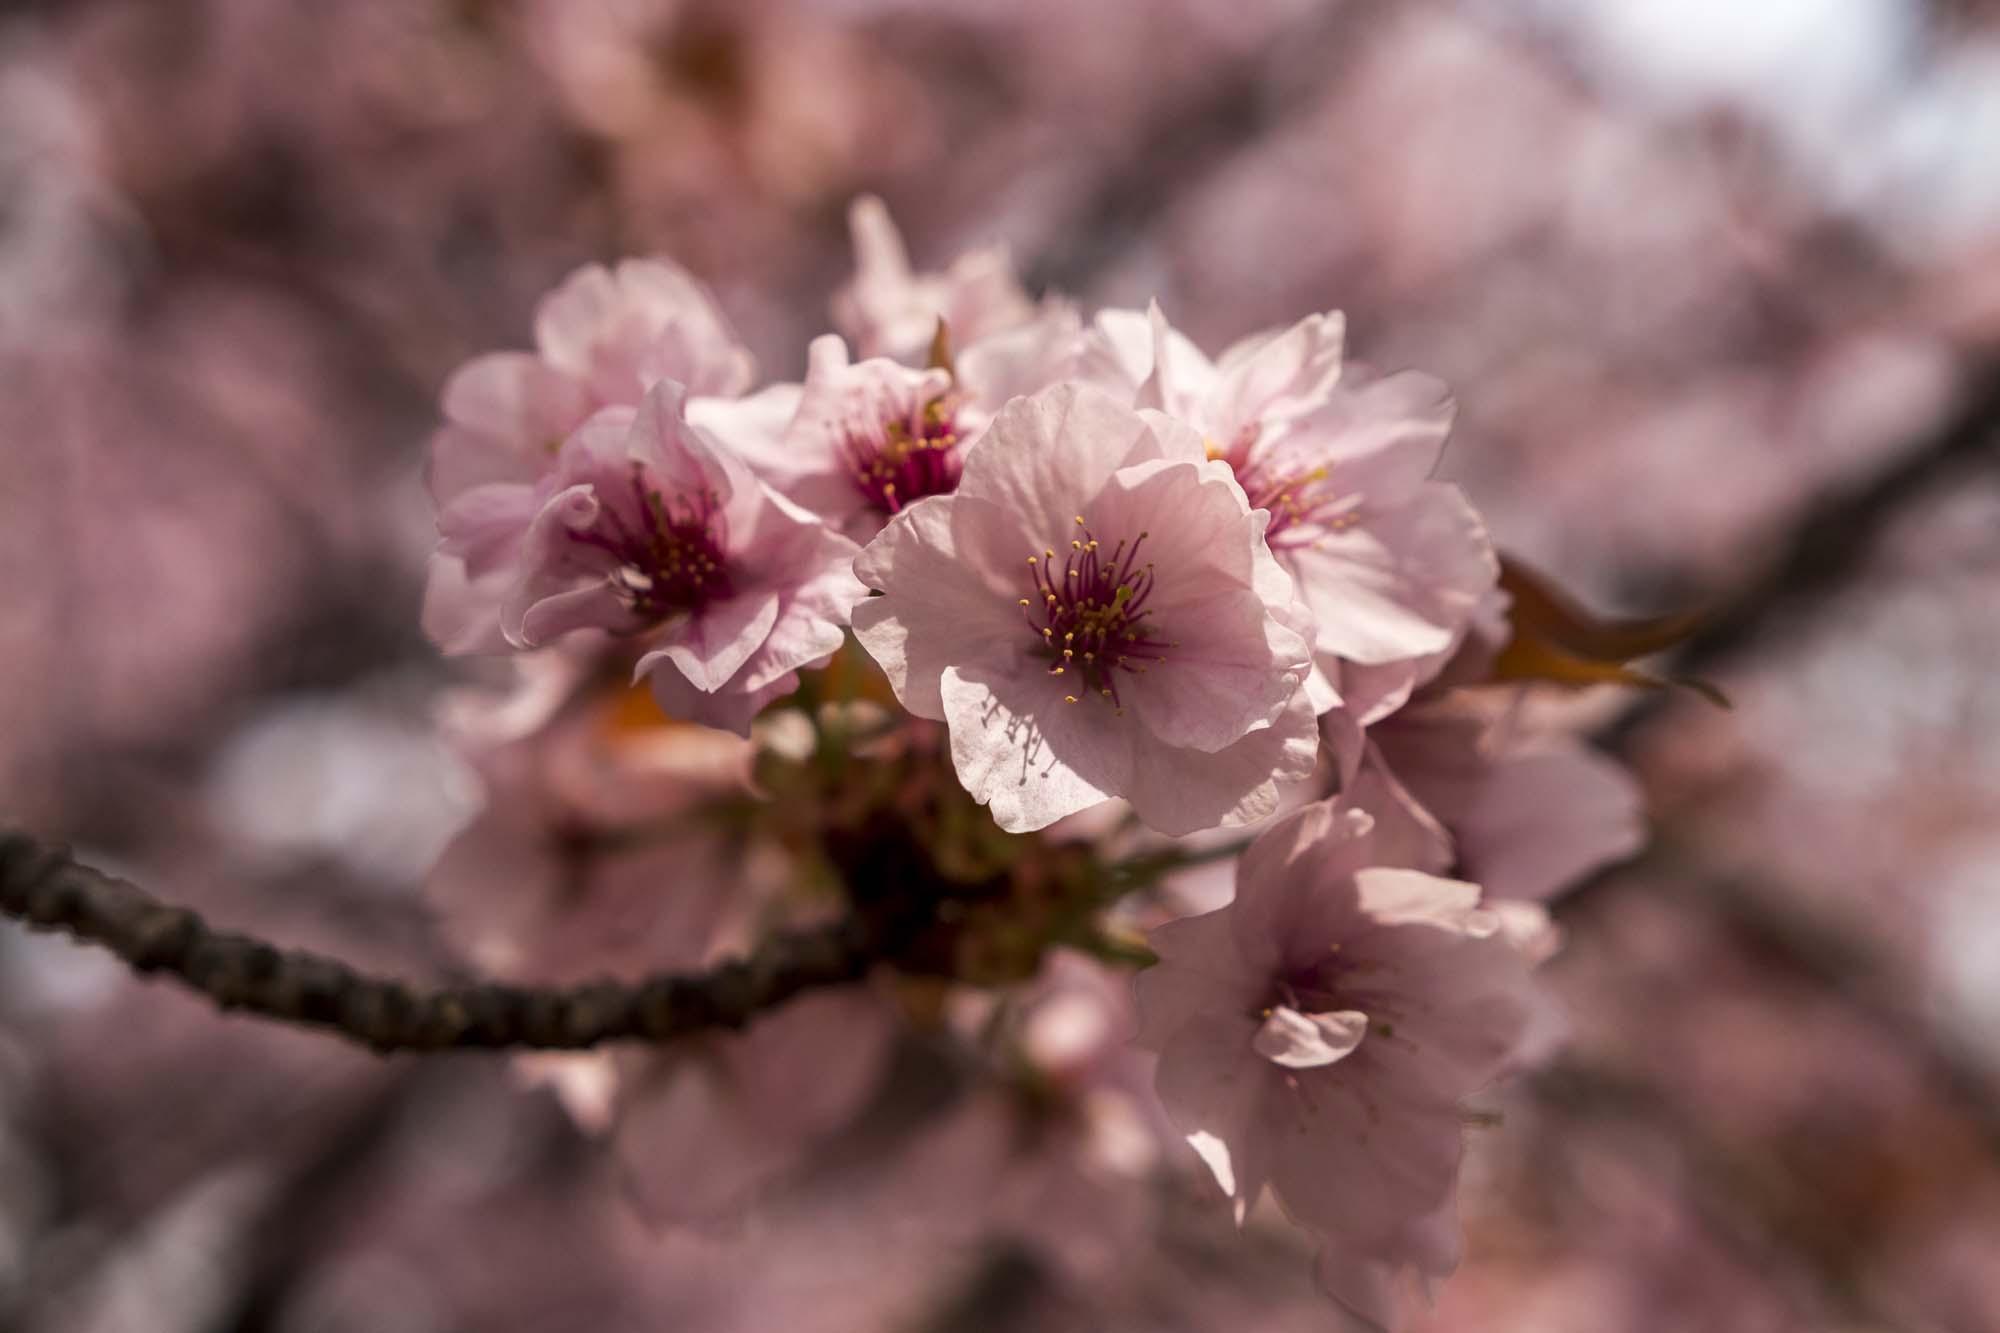 Cerisier du japon (Prunus serrulata) au Japon